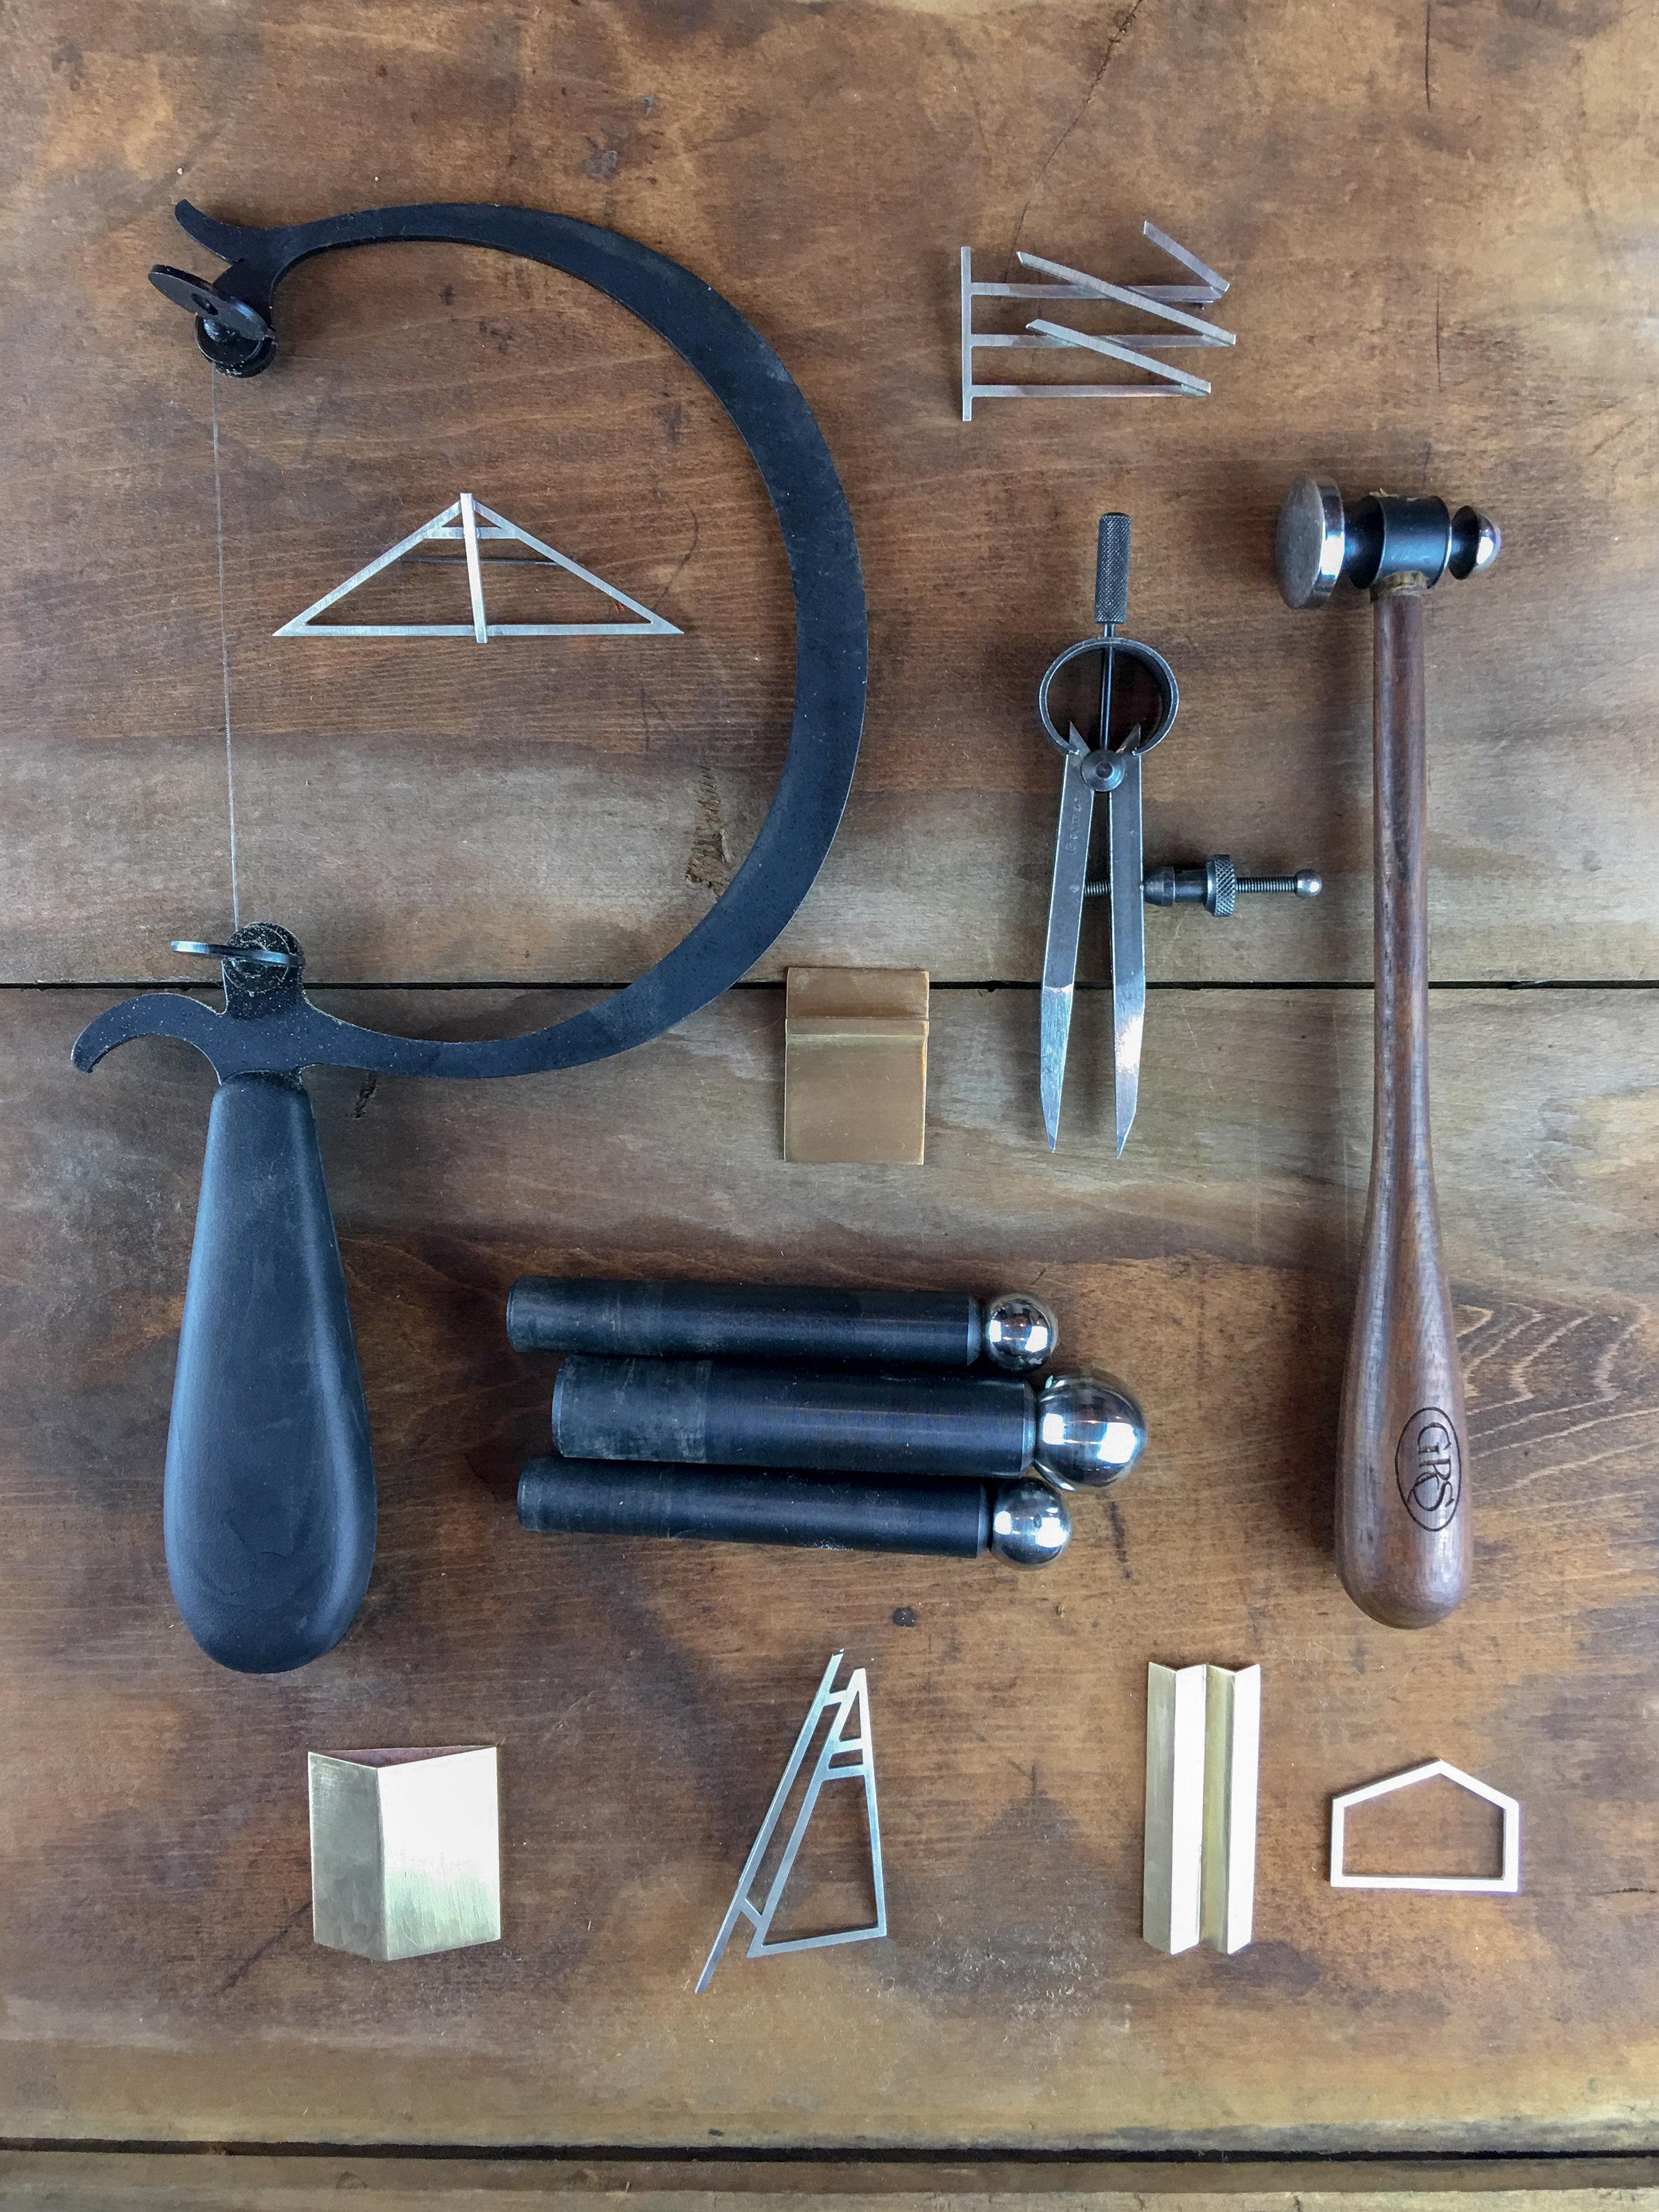 14_JewelryArchitectureArtifactsWorkshop.jpg